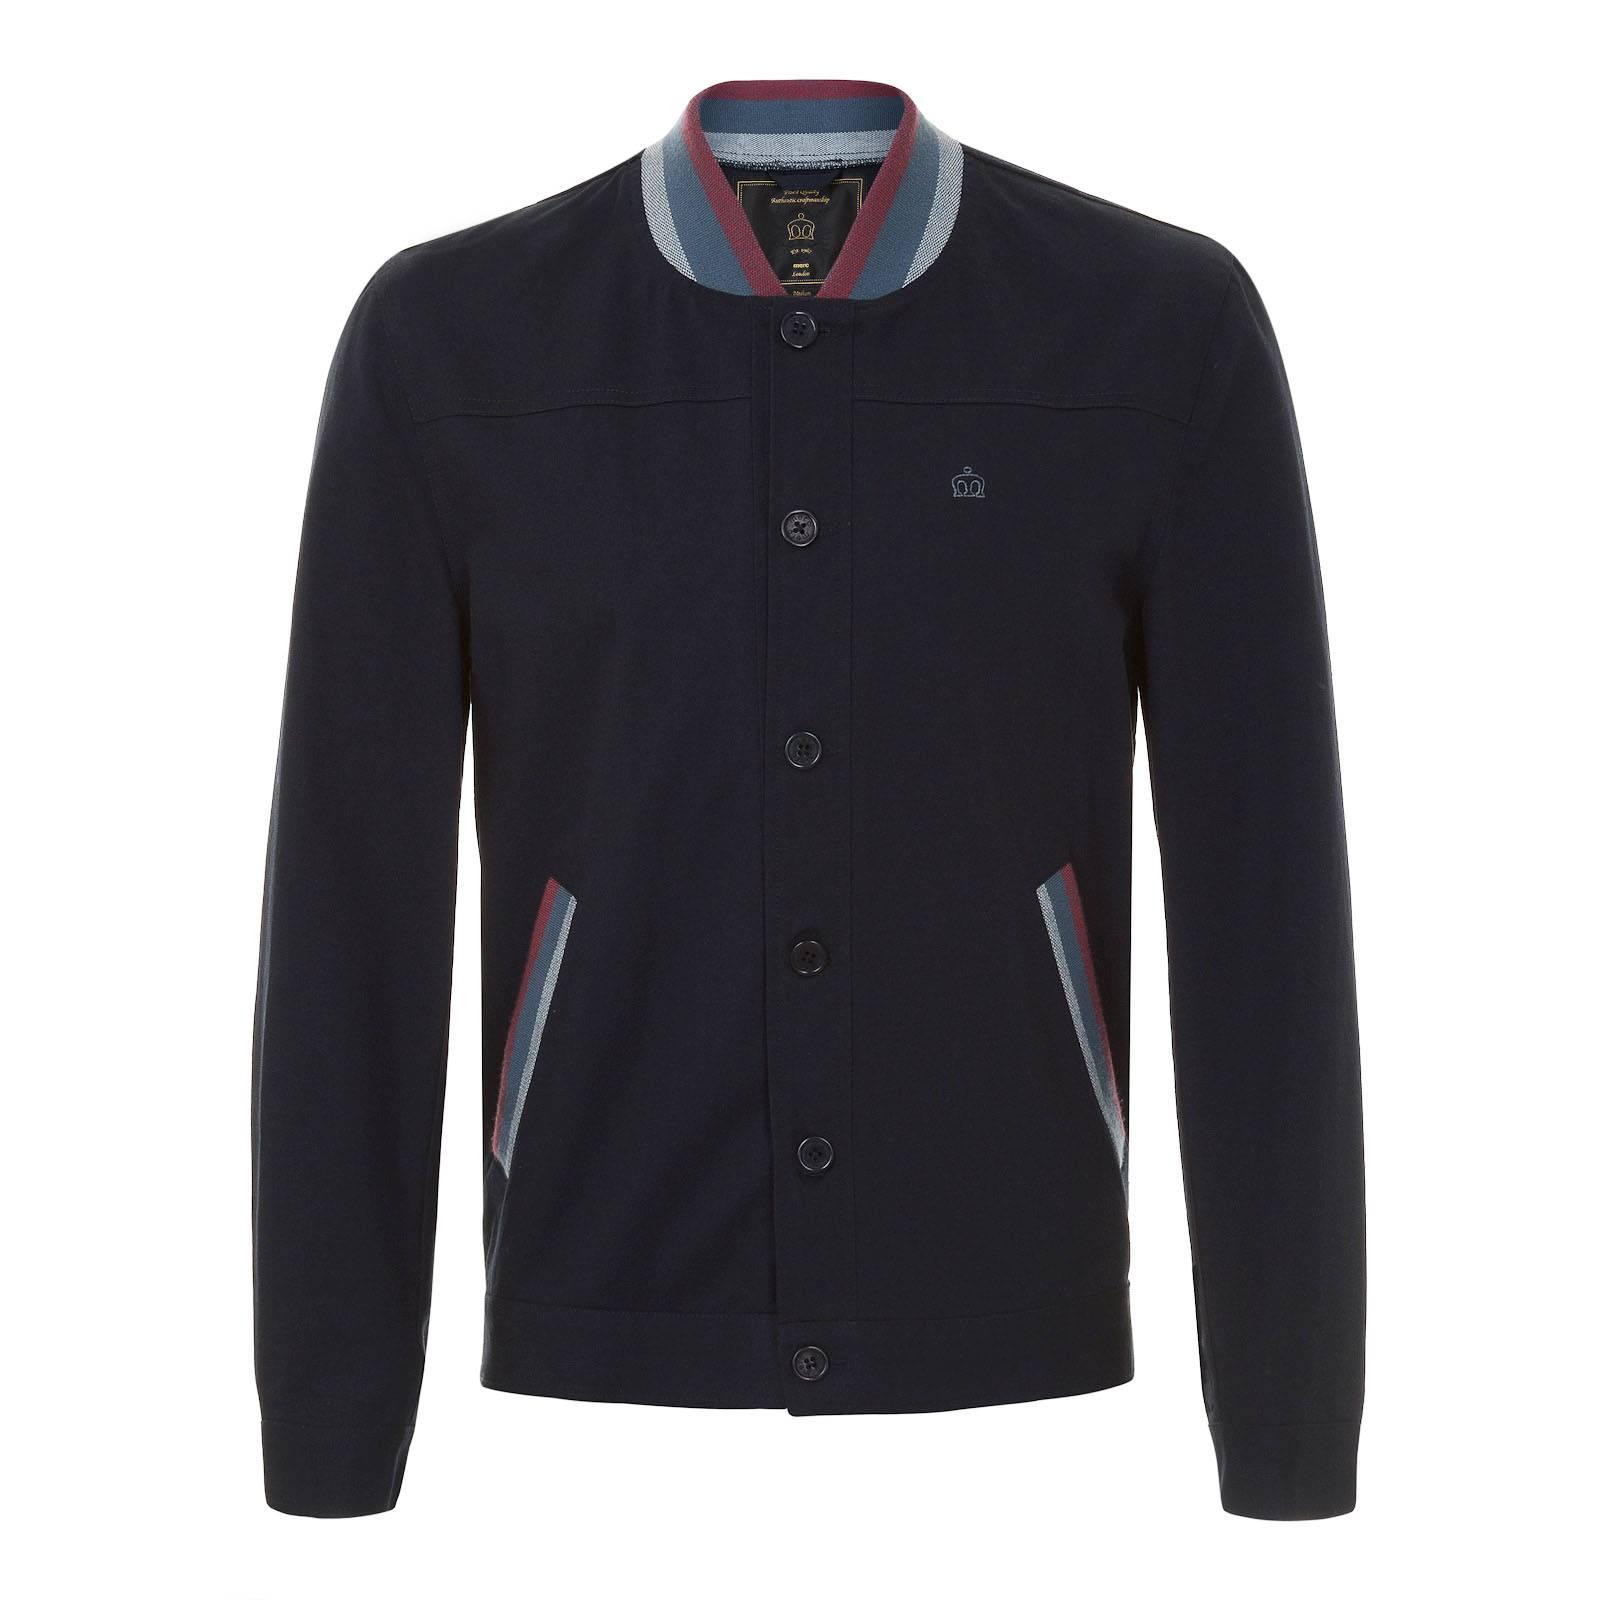 Куртка BuckroeВерхняя одежда<br><br><br>Артикул: 1115103<br>Материал: 100% хлопок<br>Цвет: темно-синий<br>Пол: Мужской